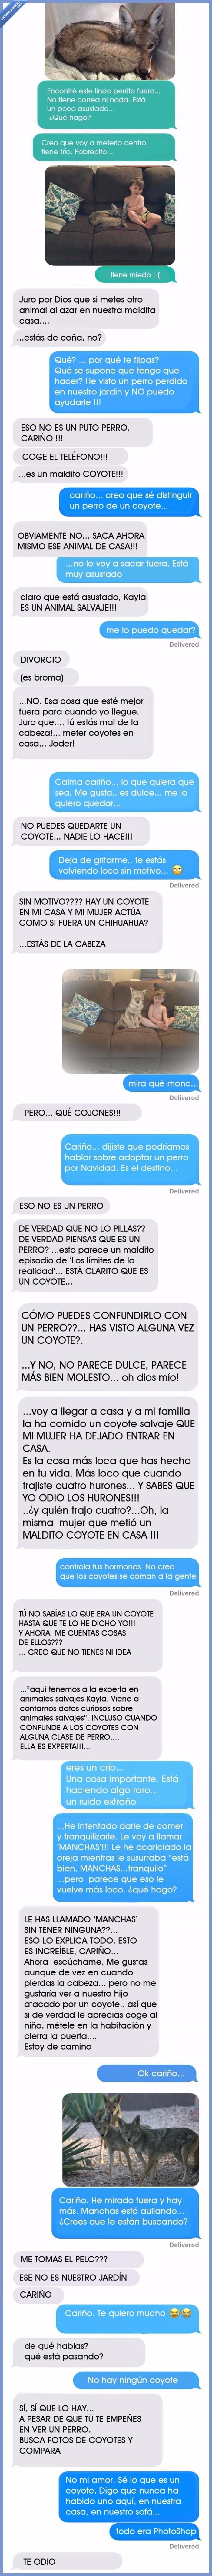 broma,coyote,marido,mujer